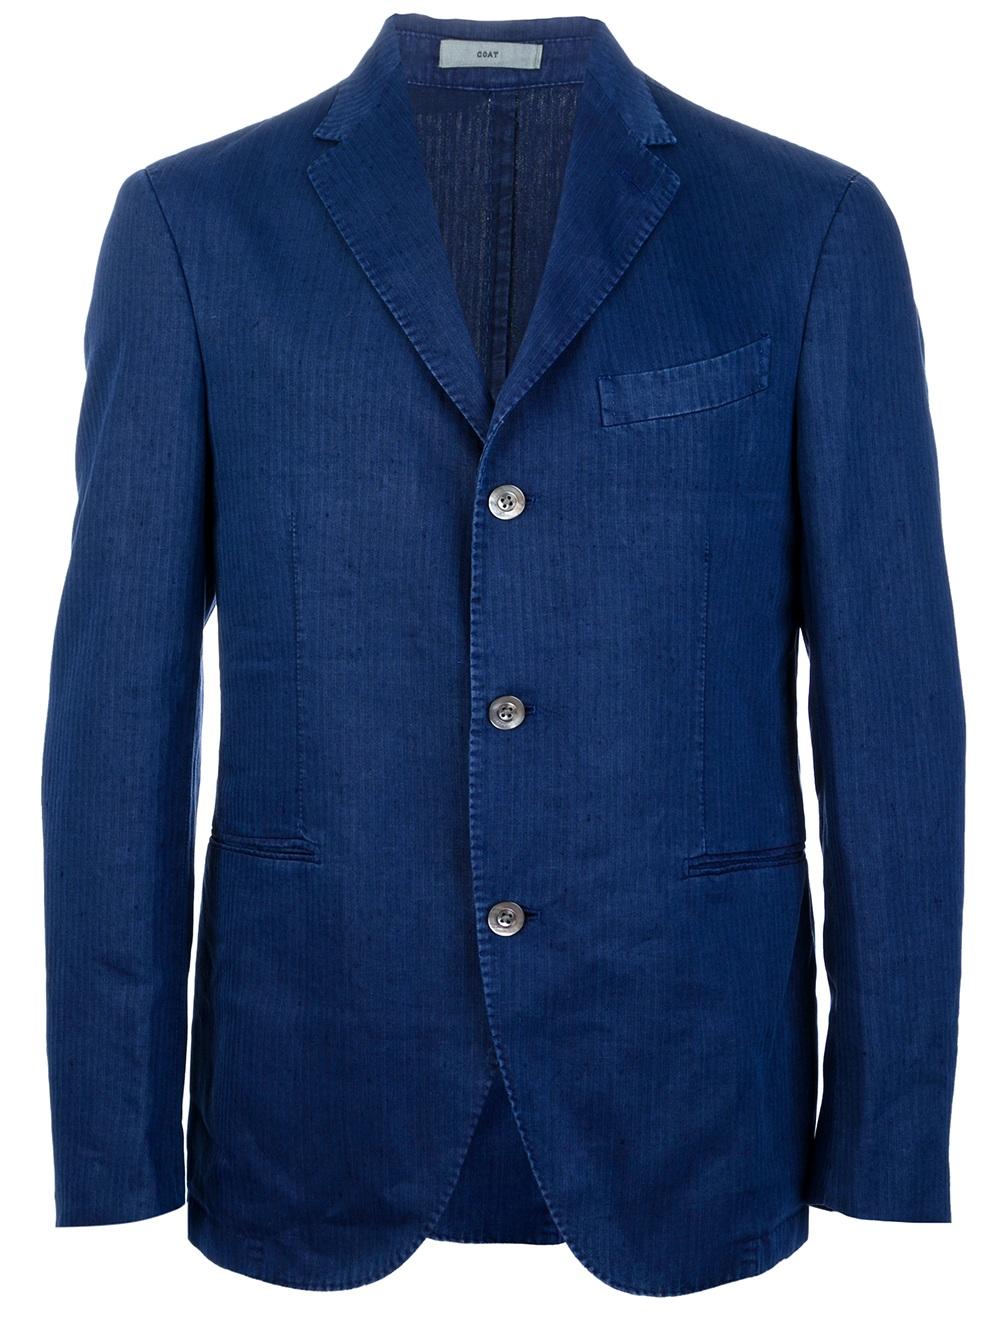 Boglioli Pinstripe Suit in Blue for Men